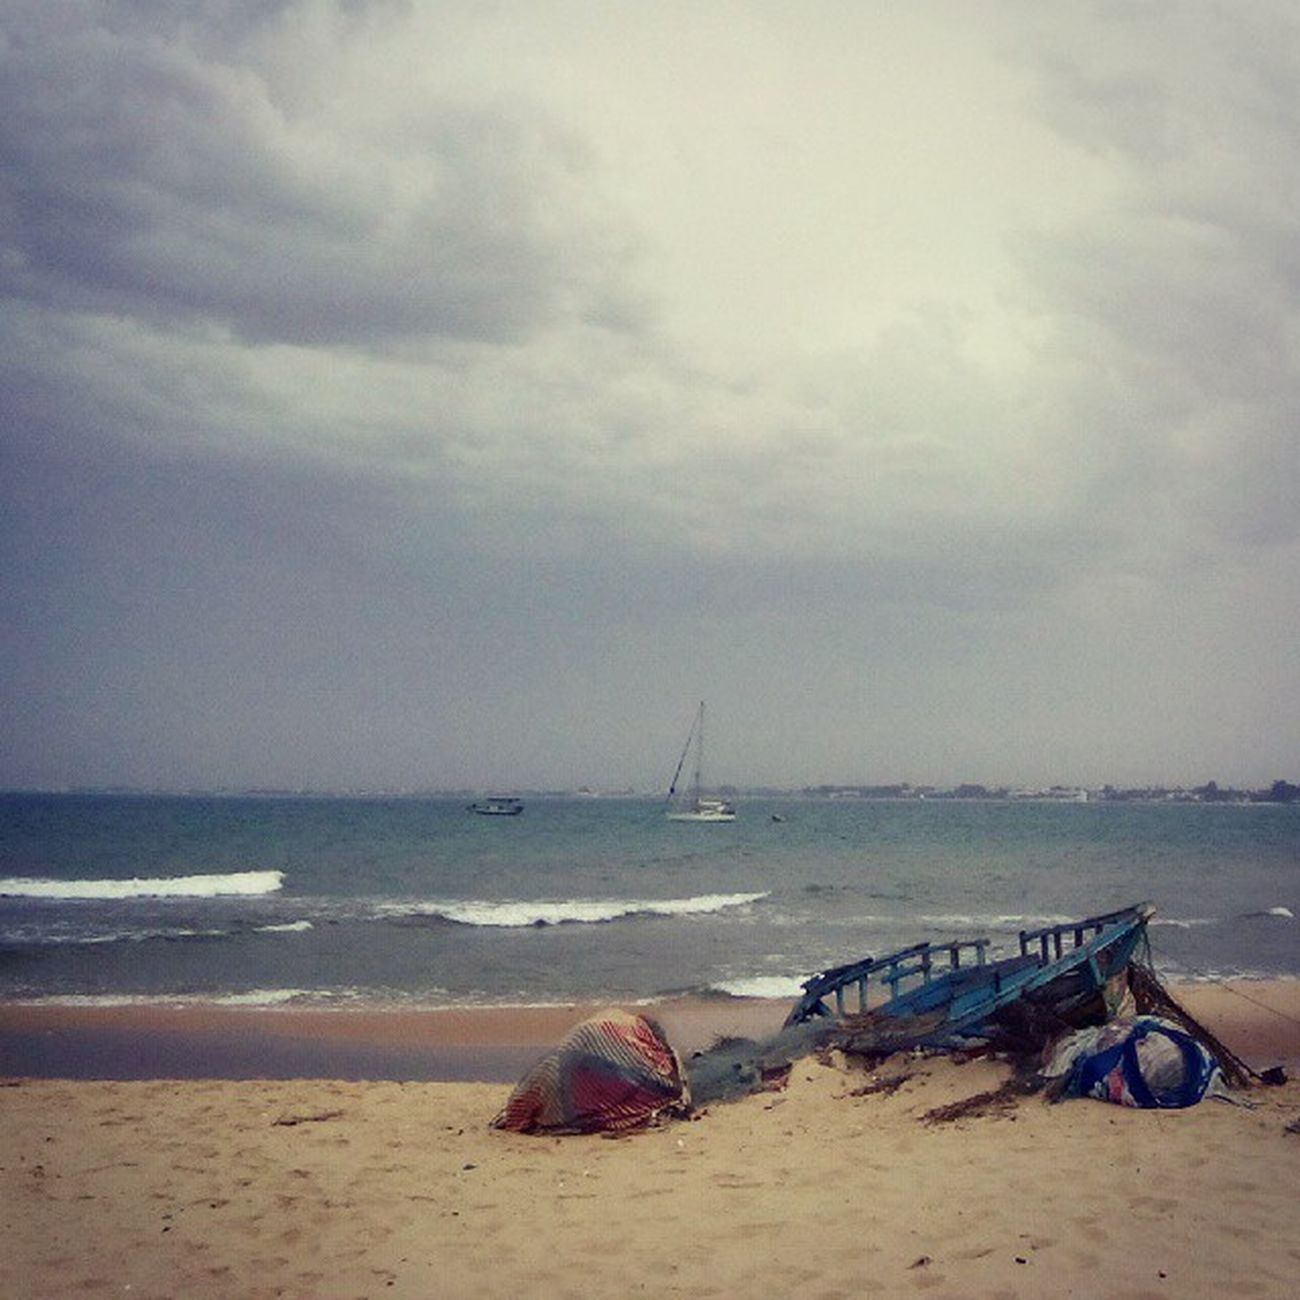 Tunesia Tunisia Sea Seaside boat clouds storm nature tagsforlikes tfl tagforlikes vacation vscovisuals vscocam mood photooftheday picoftheday planet africa